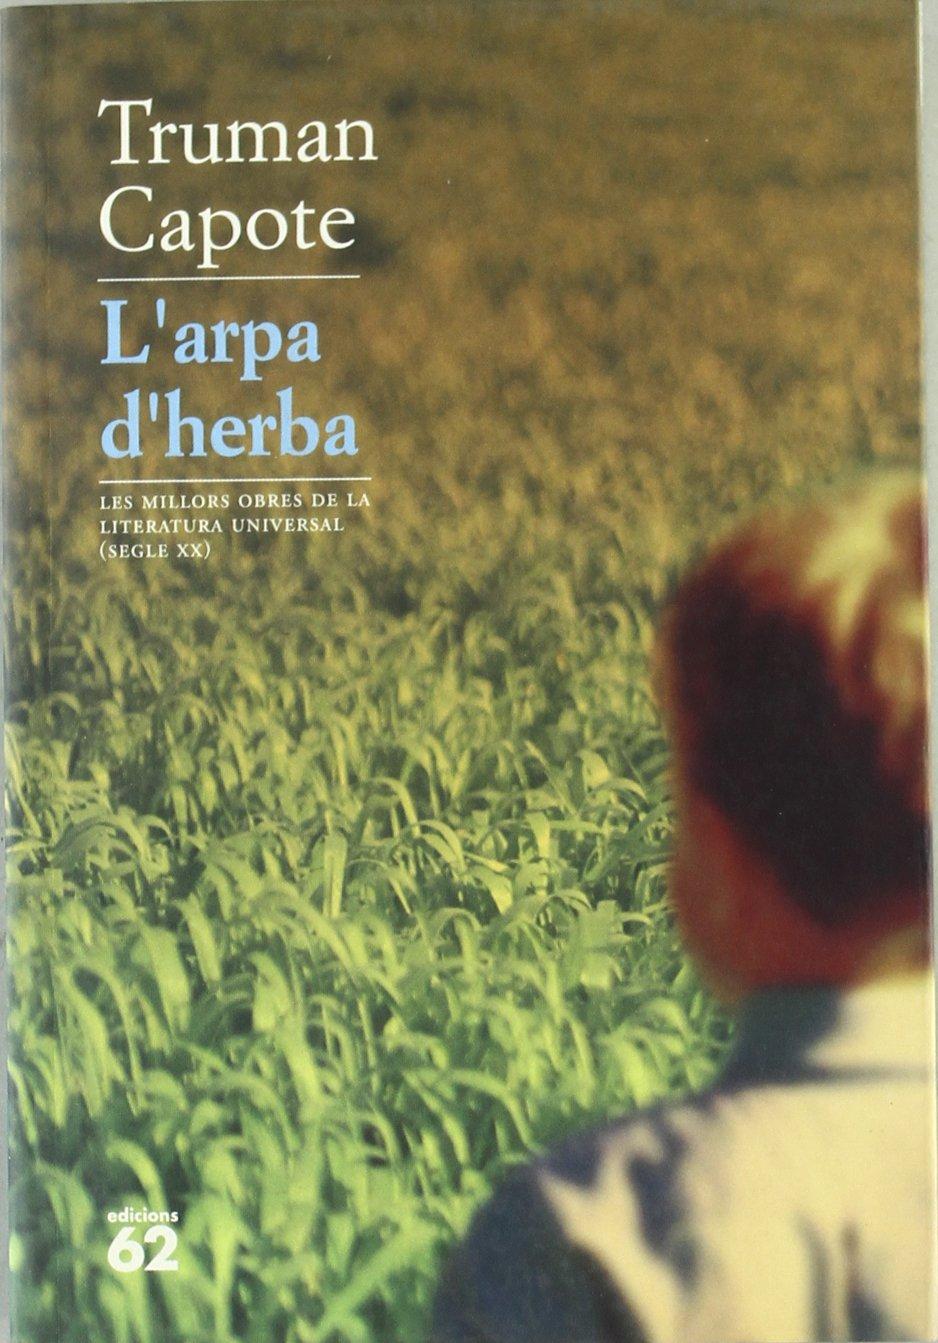 Larpa dherba MOLU s.XX - Les Millors Obres de la Literatura Universal Segle XX: Amazon.es: Truman Capote, LLUIS ANTON BAULENAS I SETO: Libros